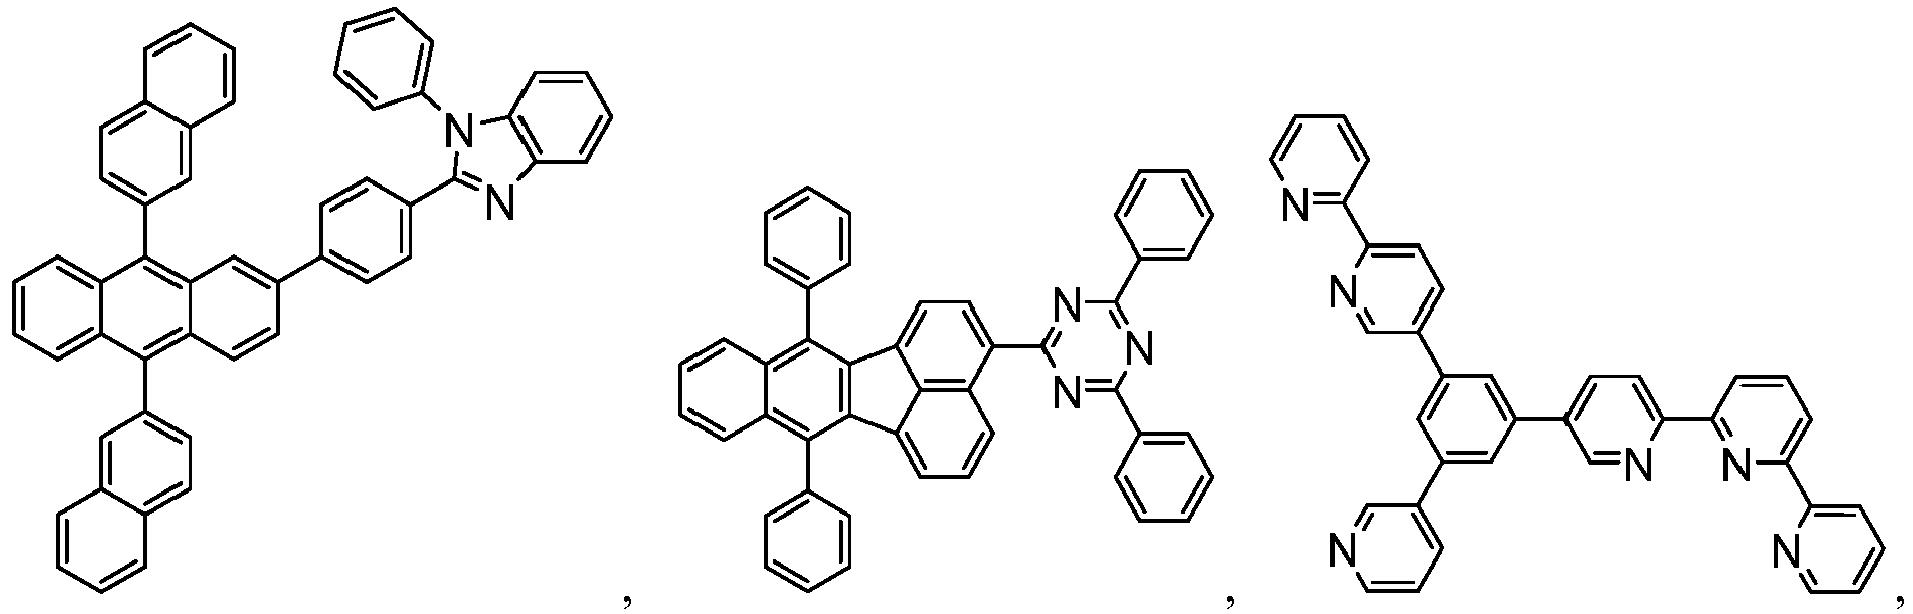 Figure imgb0946